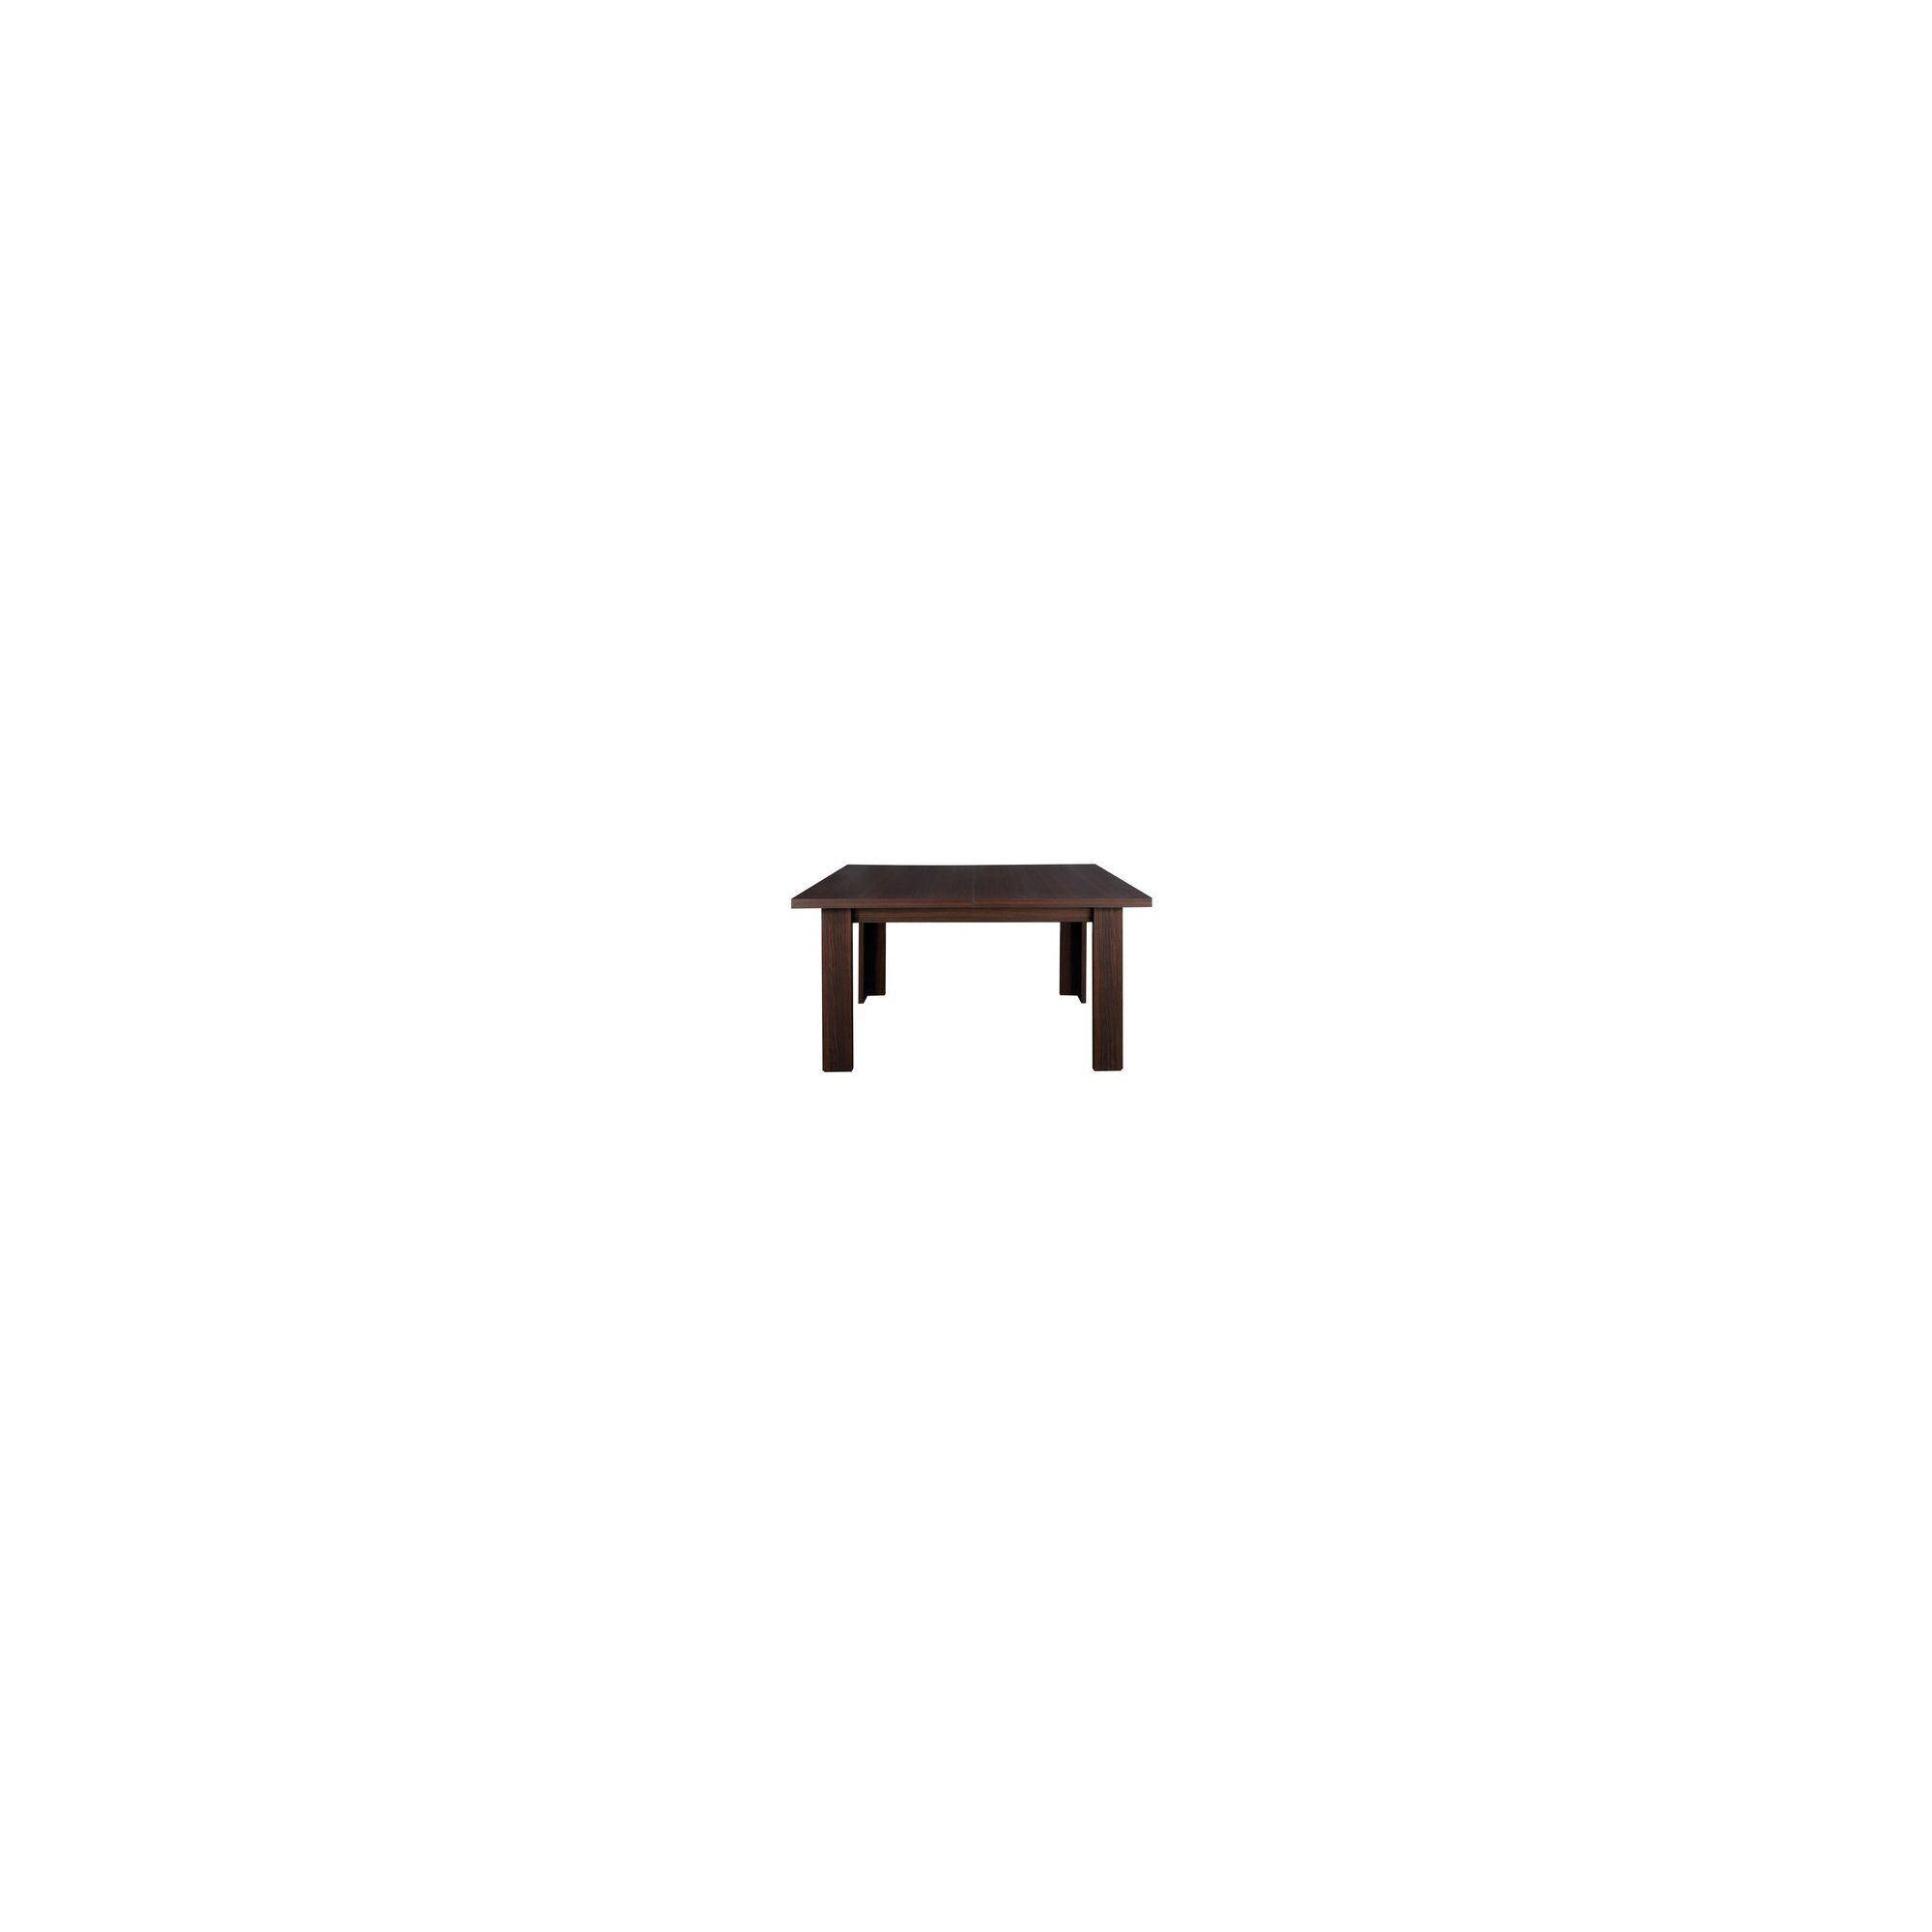 Other Caxton Royale 4 Leg Extending Dining Table in Dark Oak - 150-193cm